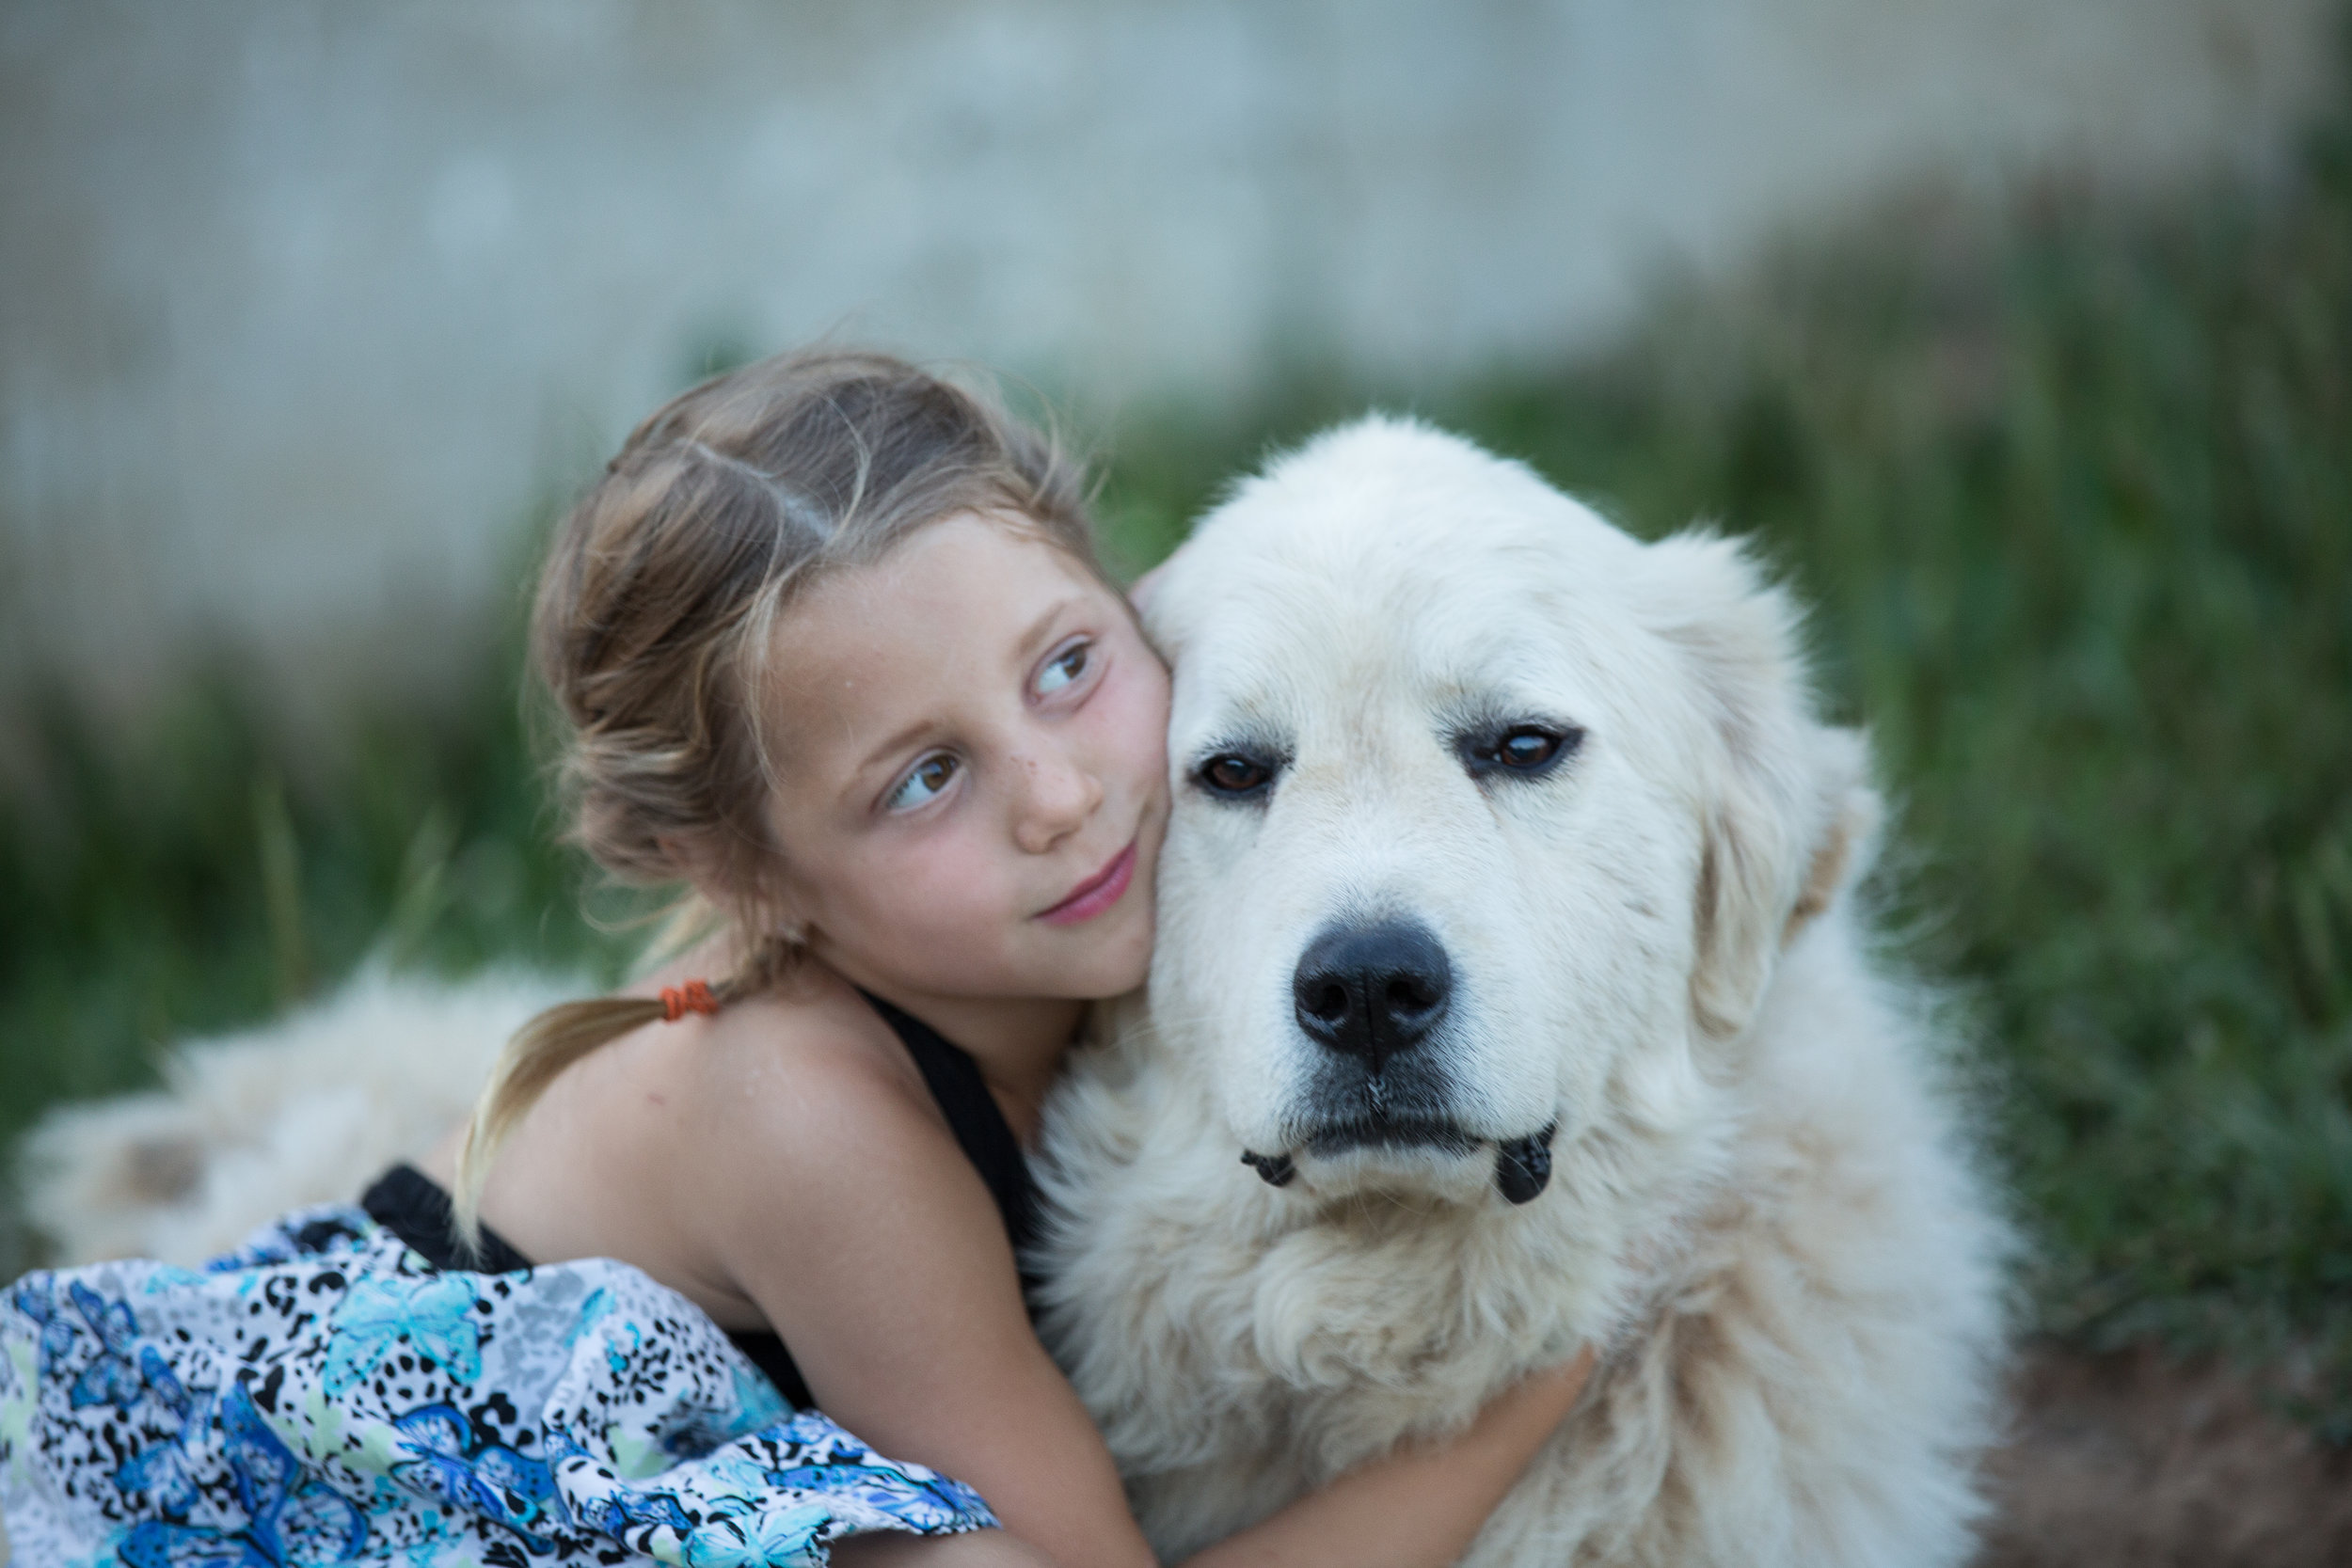 Kid with friendly livestock guardian dog on a flower farm